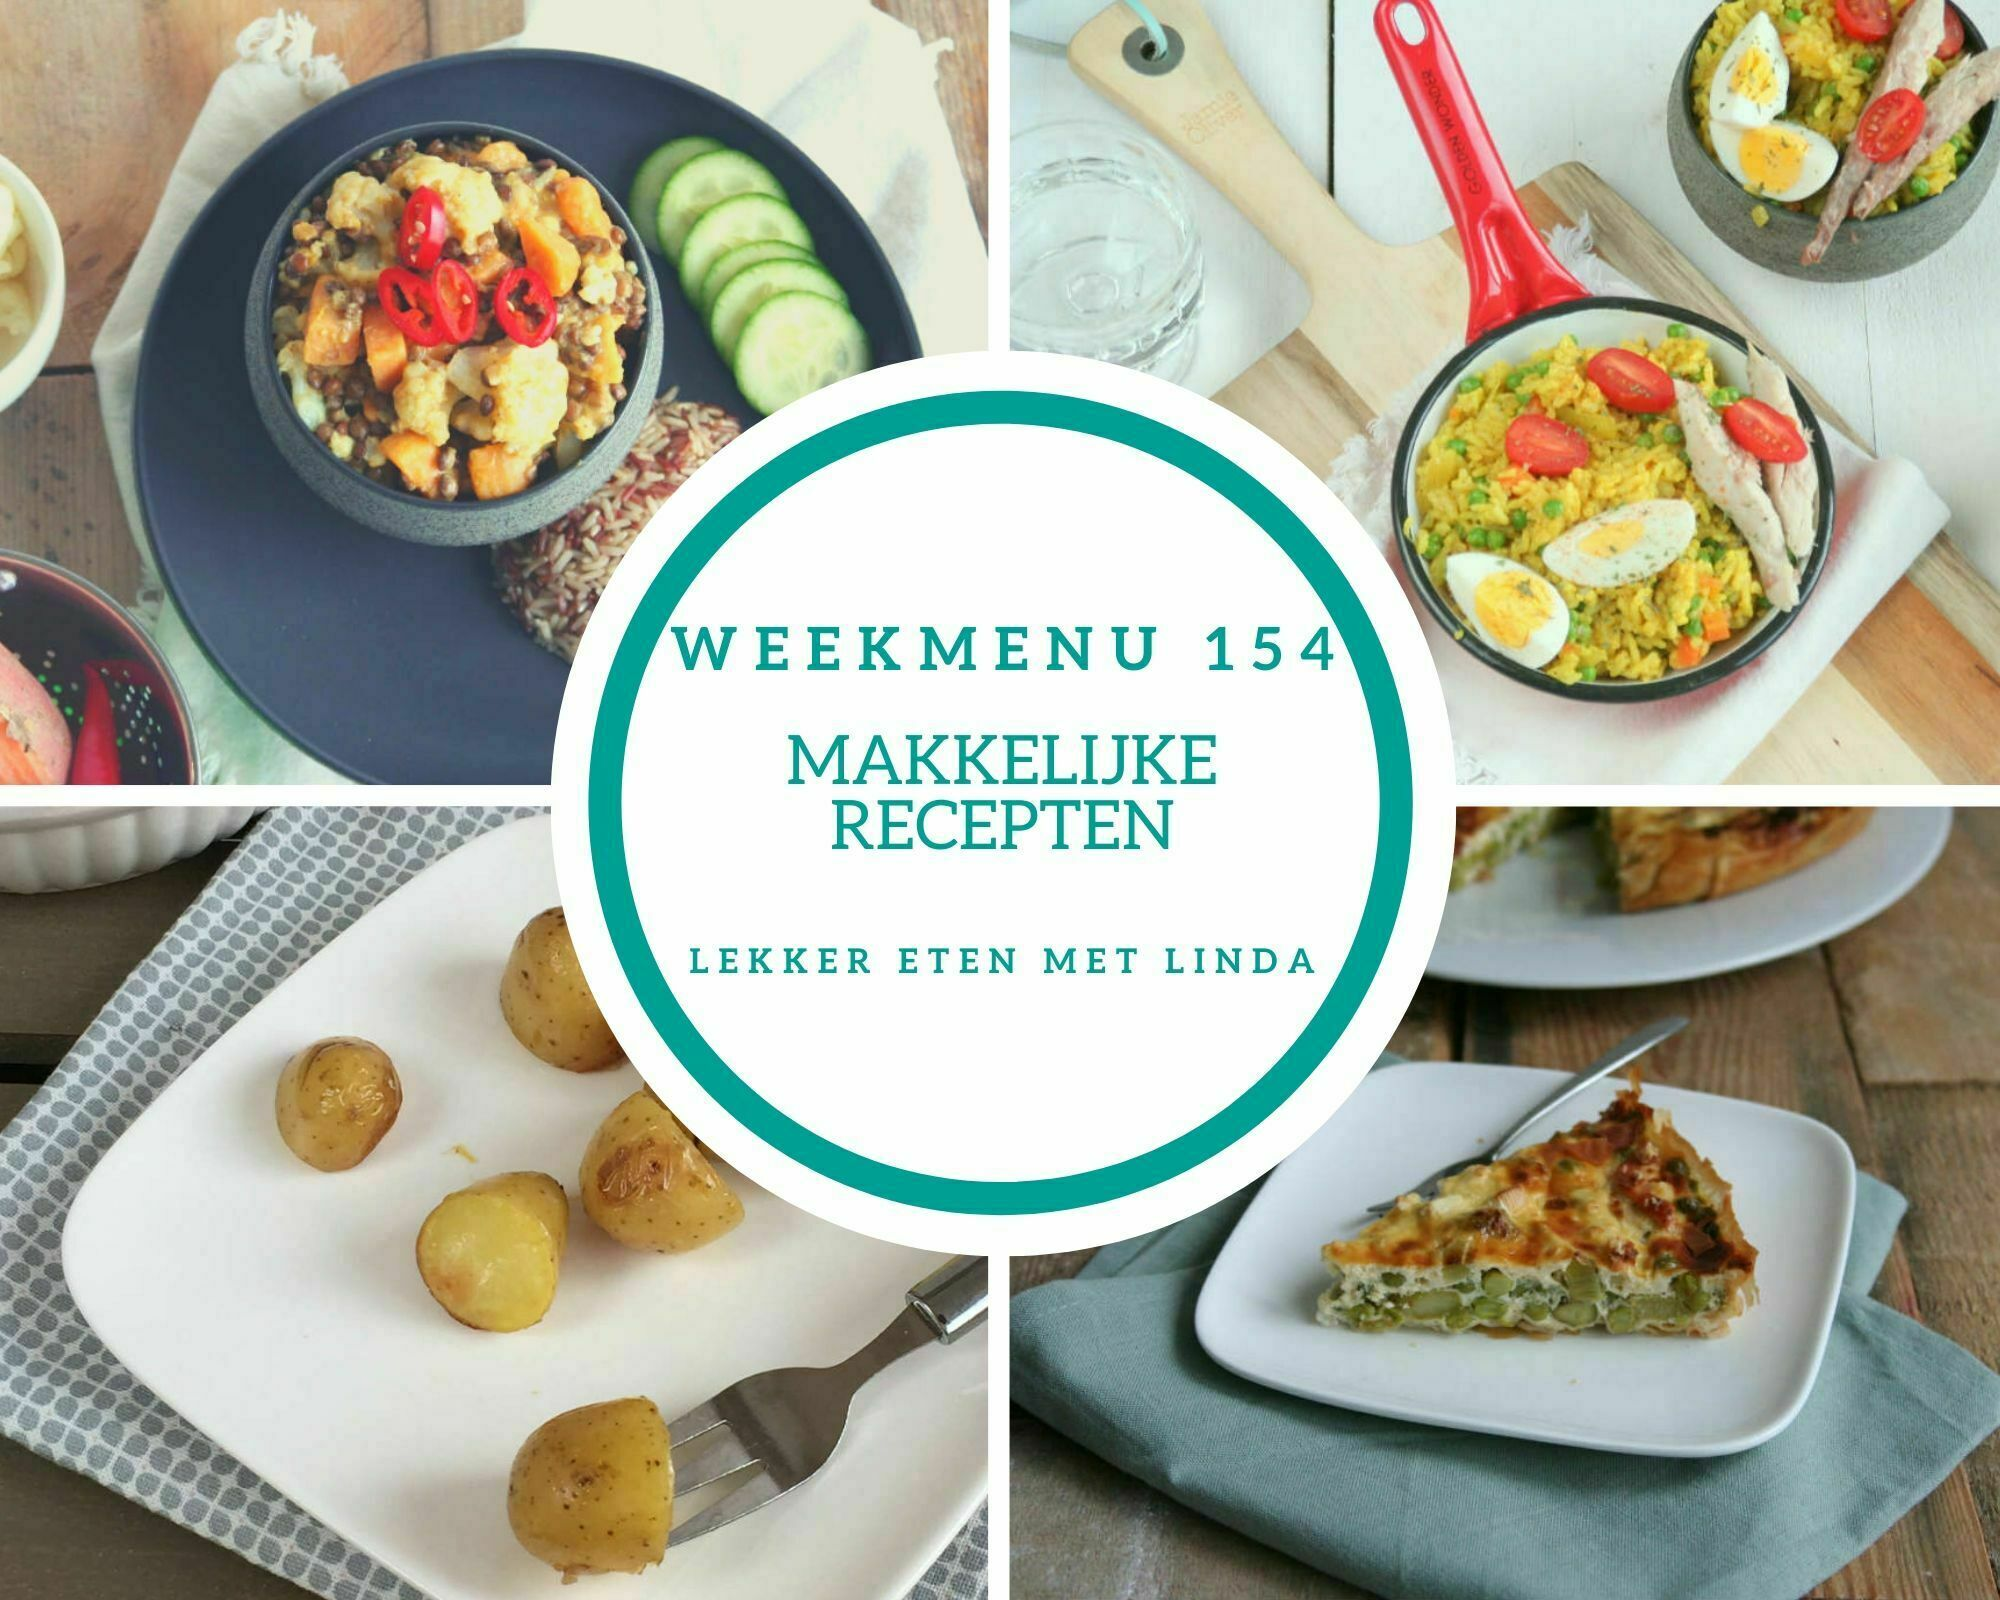 Weekmenu 154 makkelijke recepten